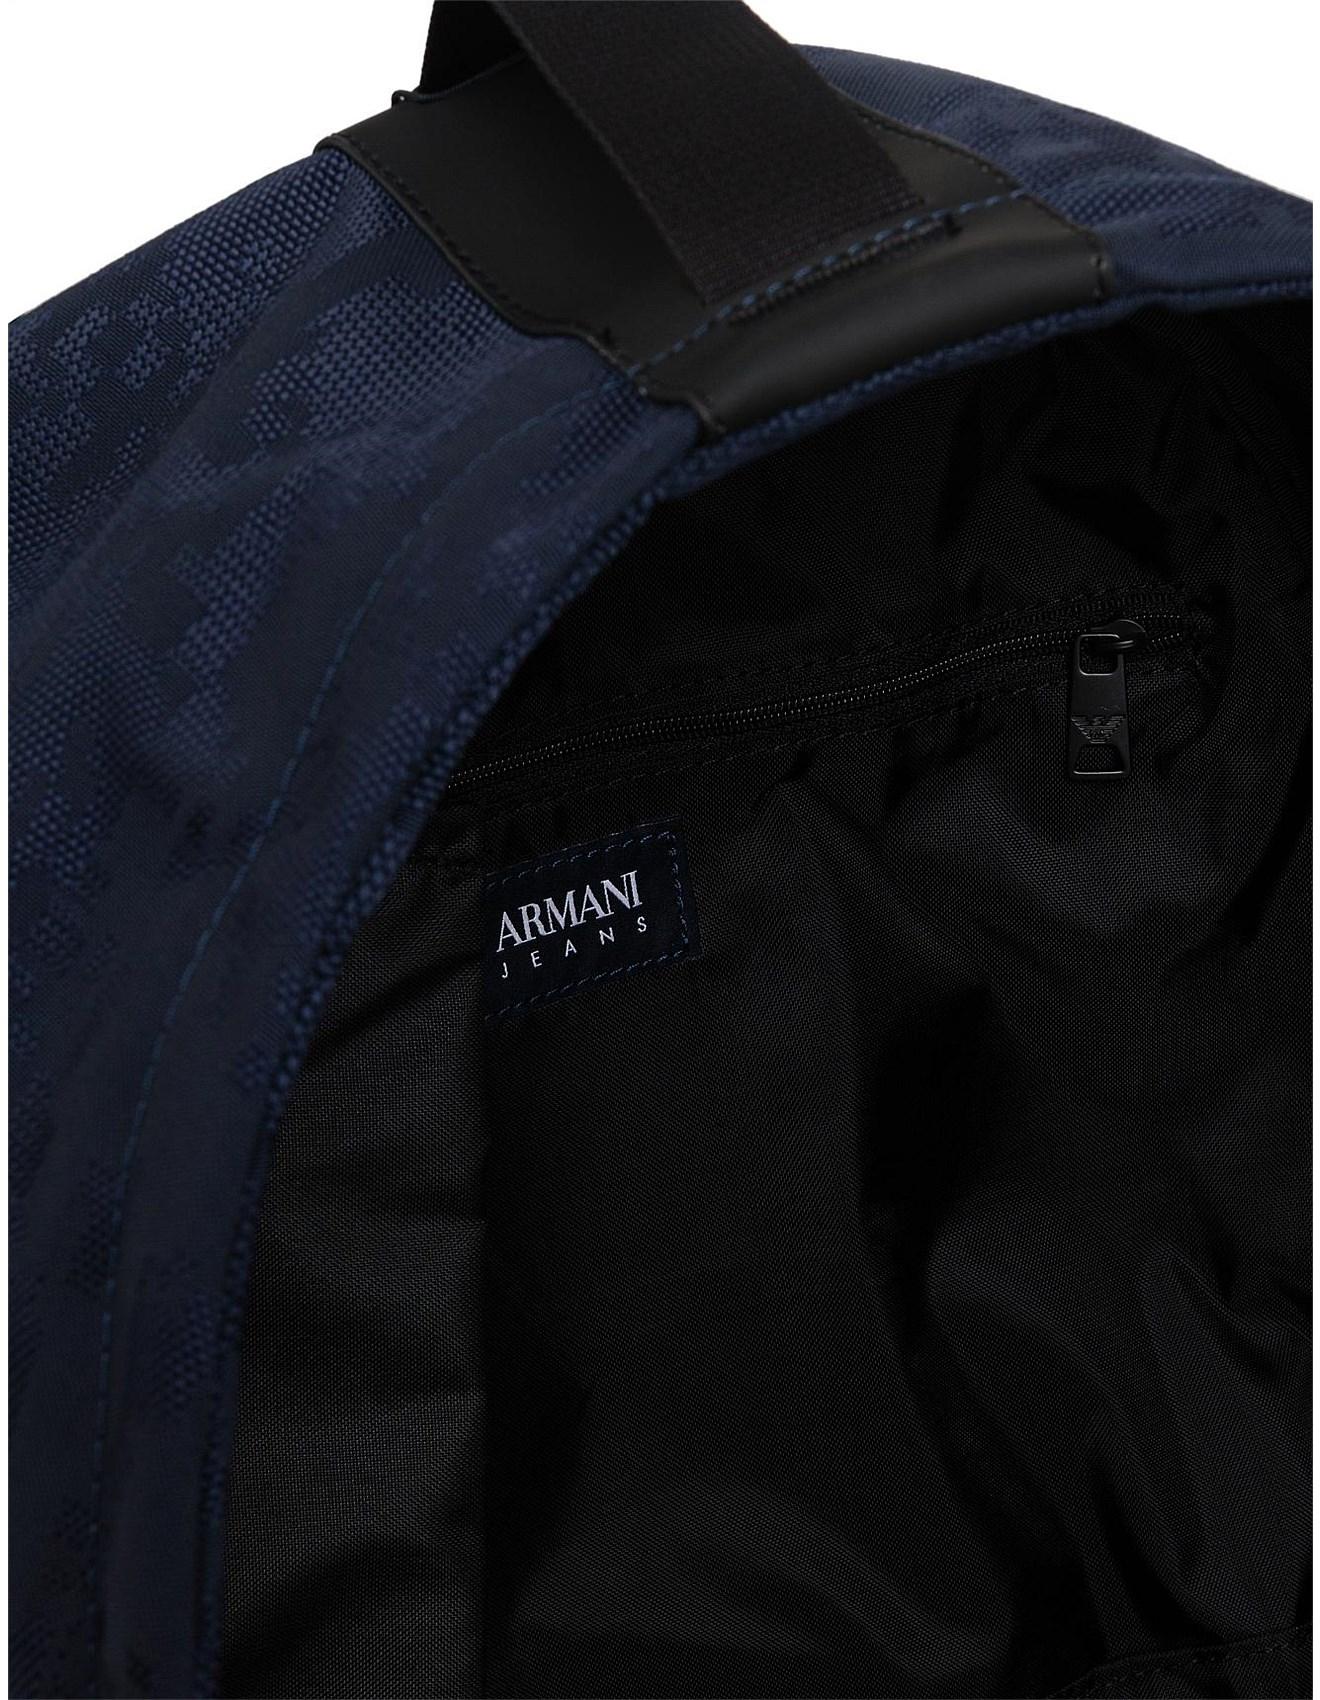 Digital camo printed nylon Backpack. 1  2  3. Zoom. Armani Jeans 34784e3fcc234